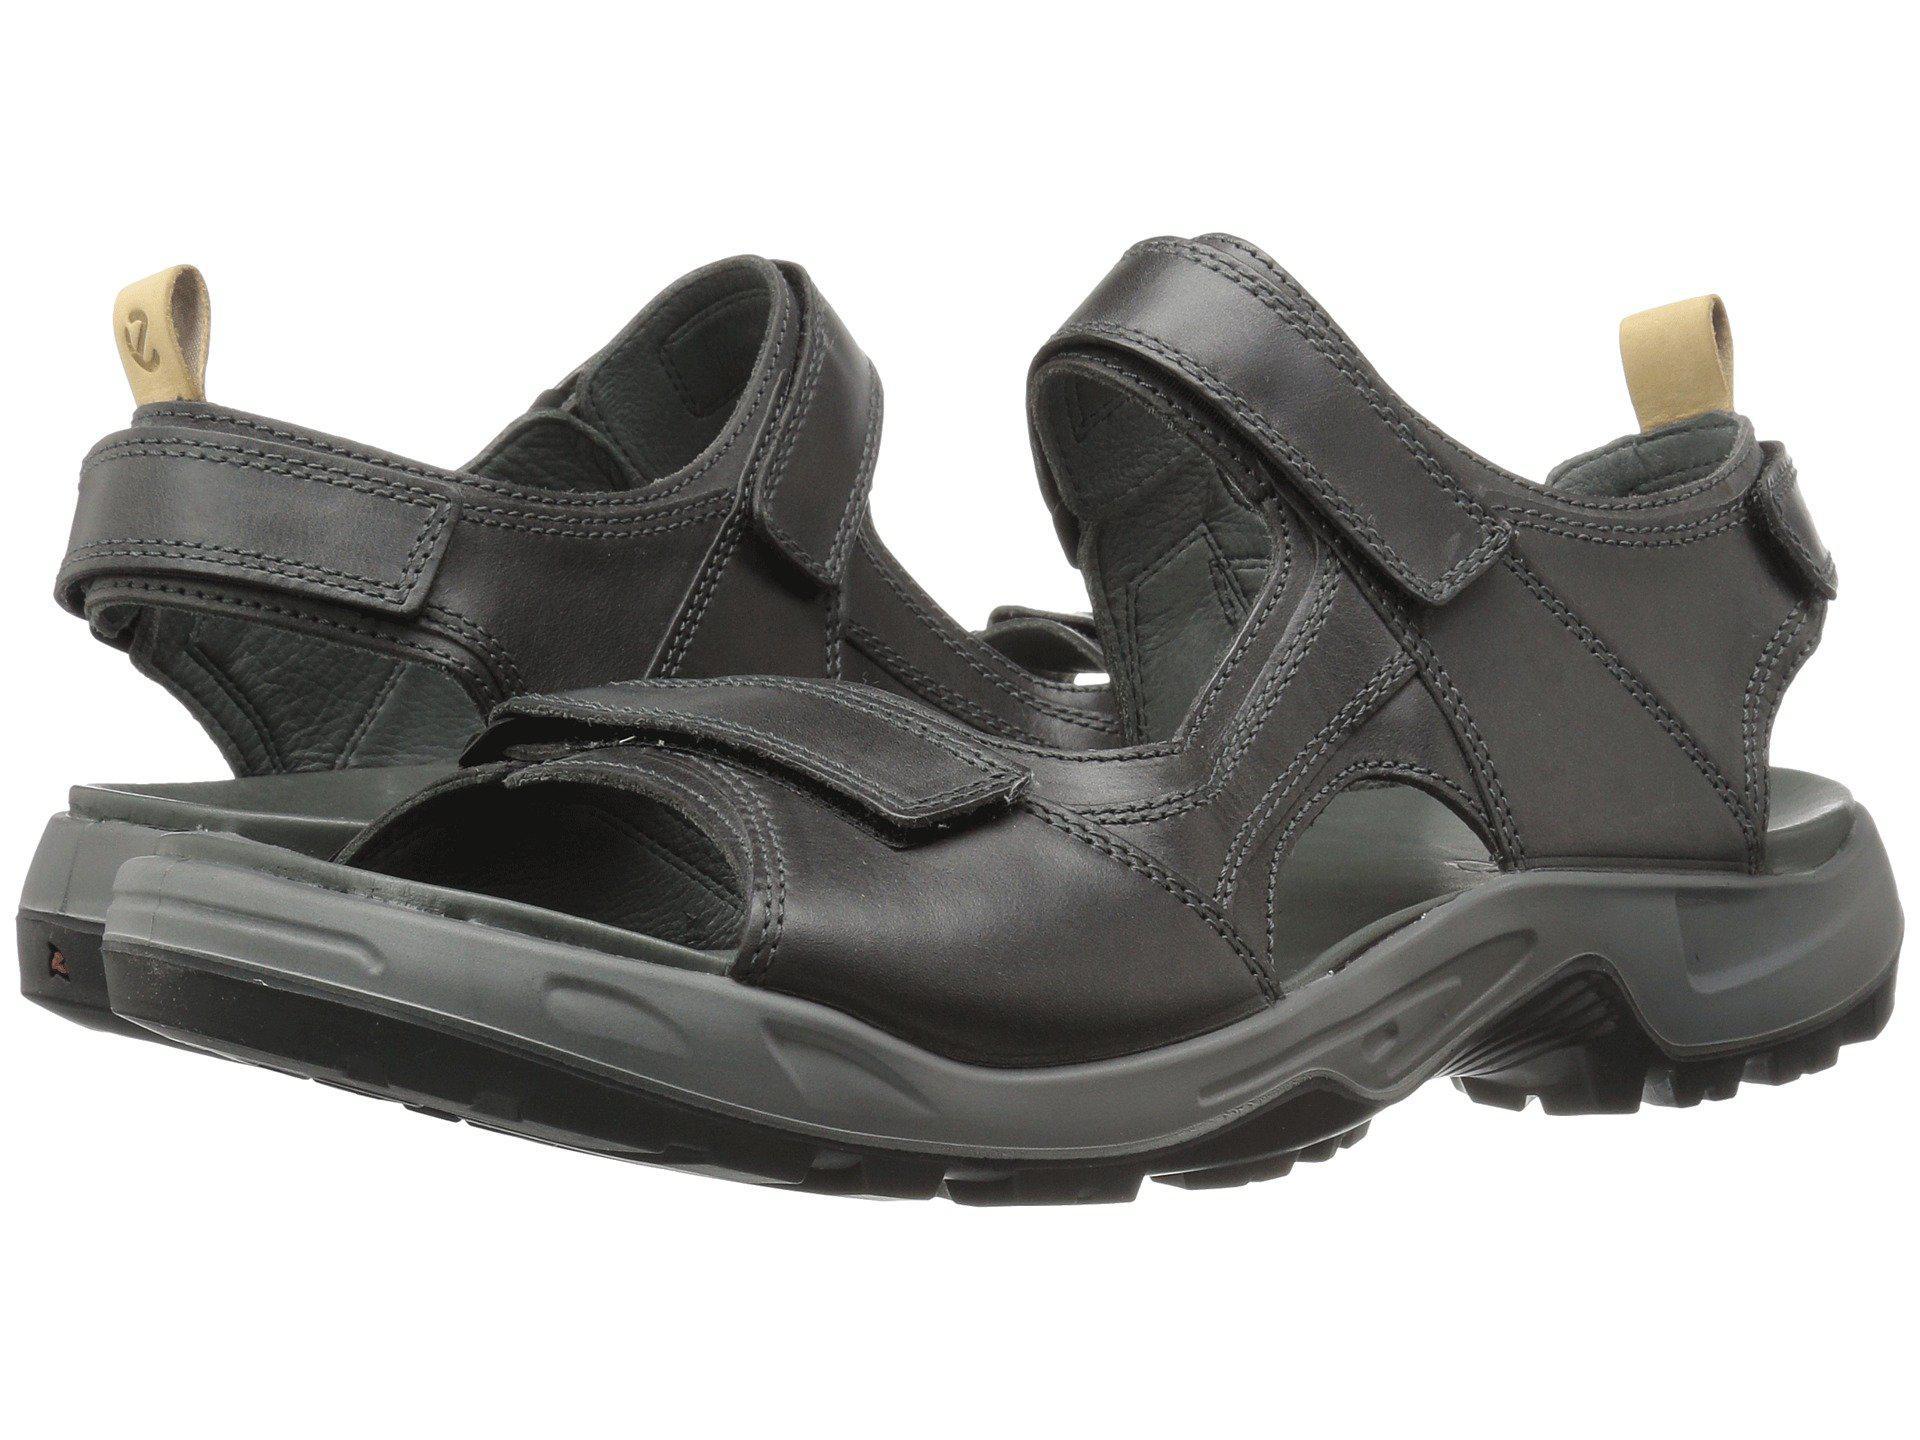 c2538dff3cf5 Lyst - Ecco Offroad 2.0 Sandal (cocoa Brown powder) Men s Sandals ...